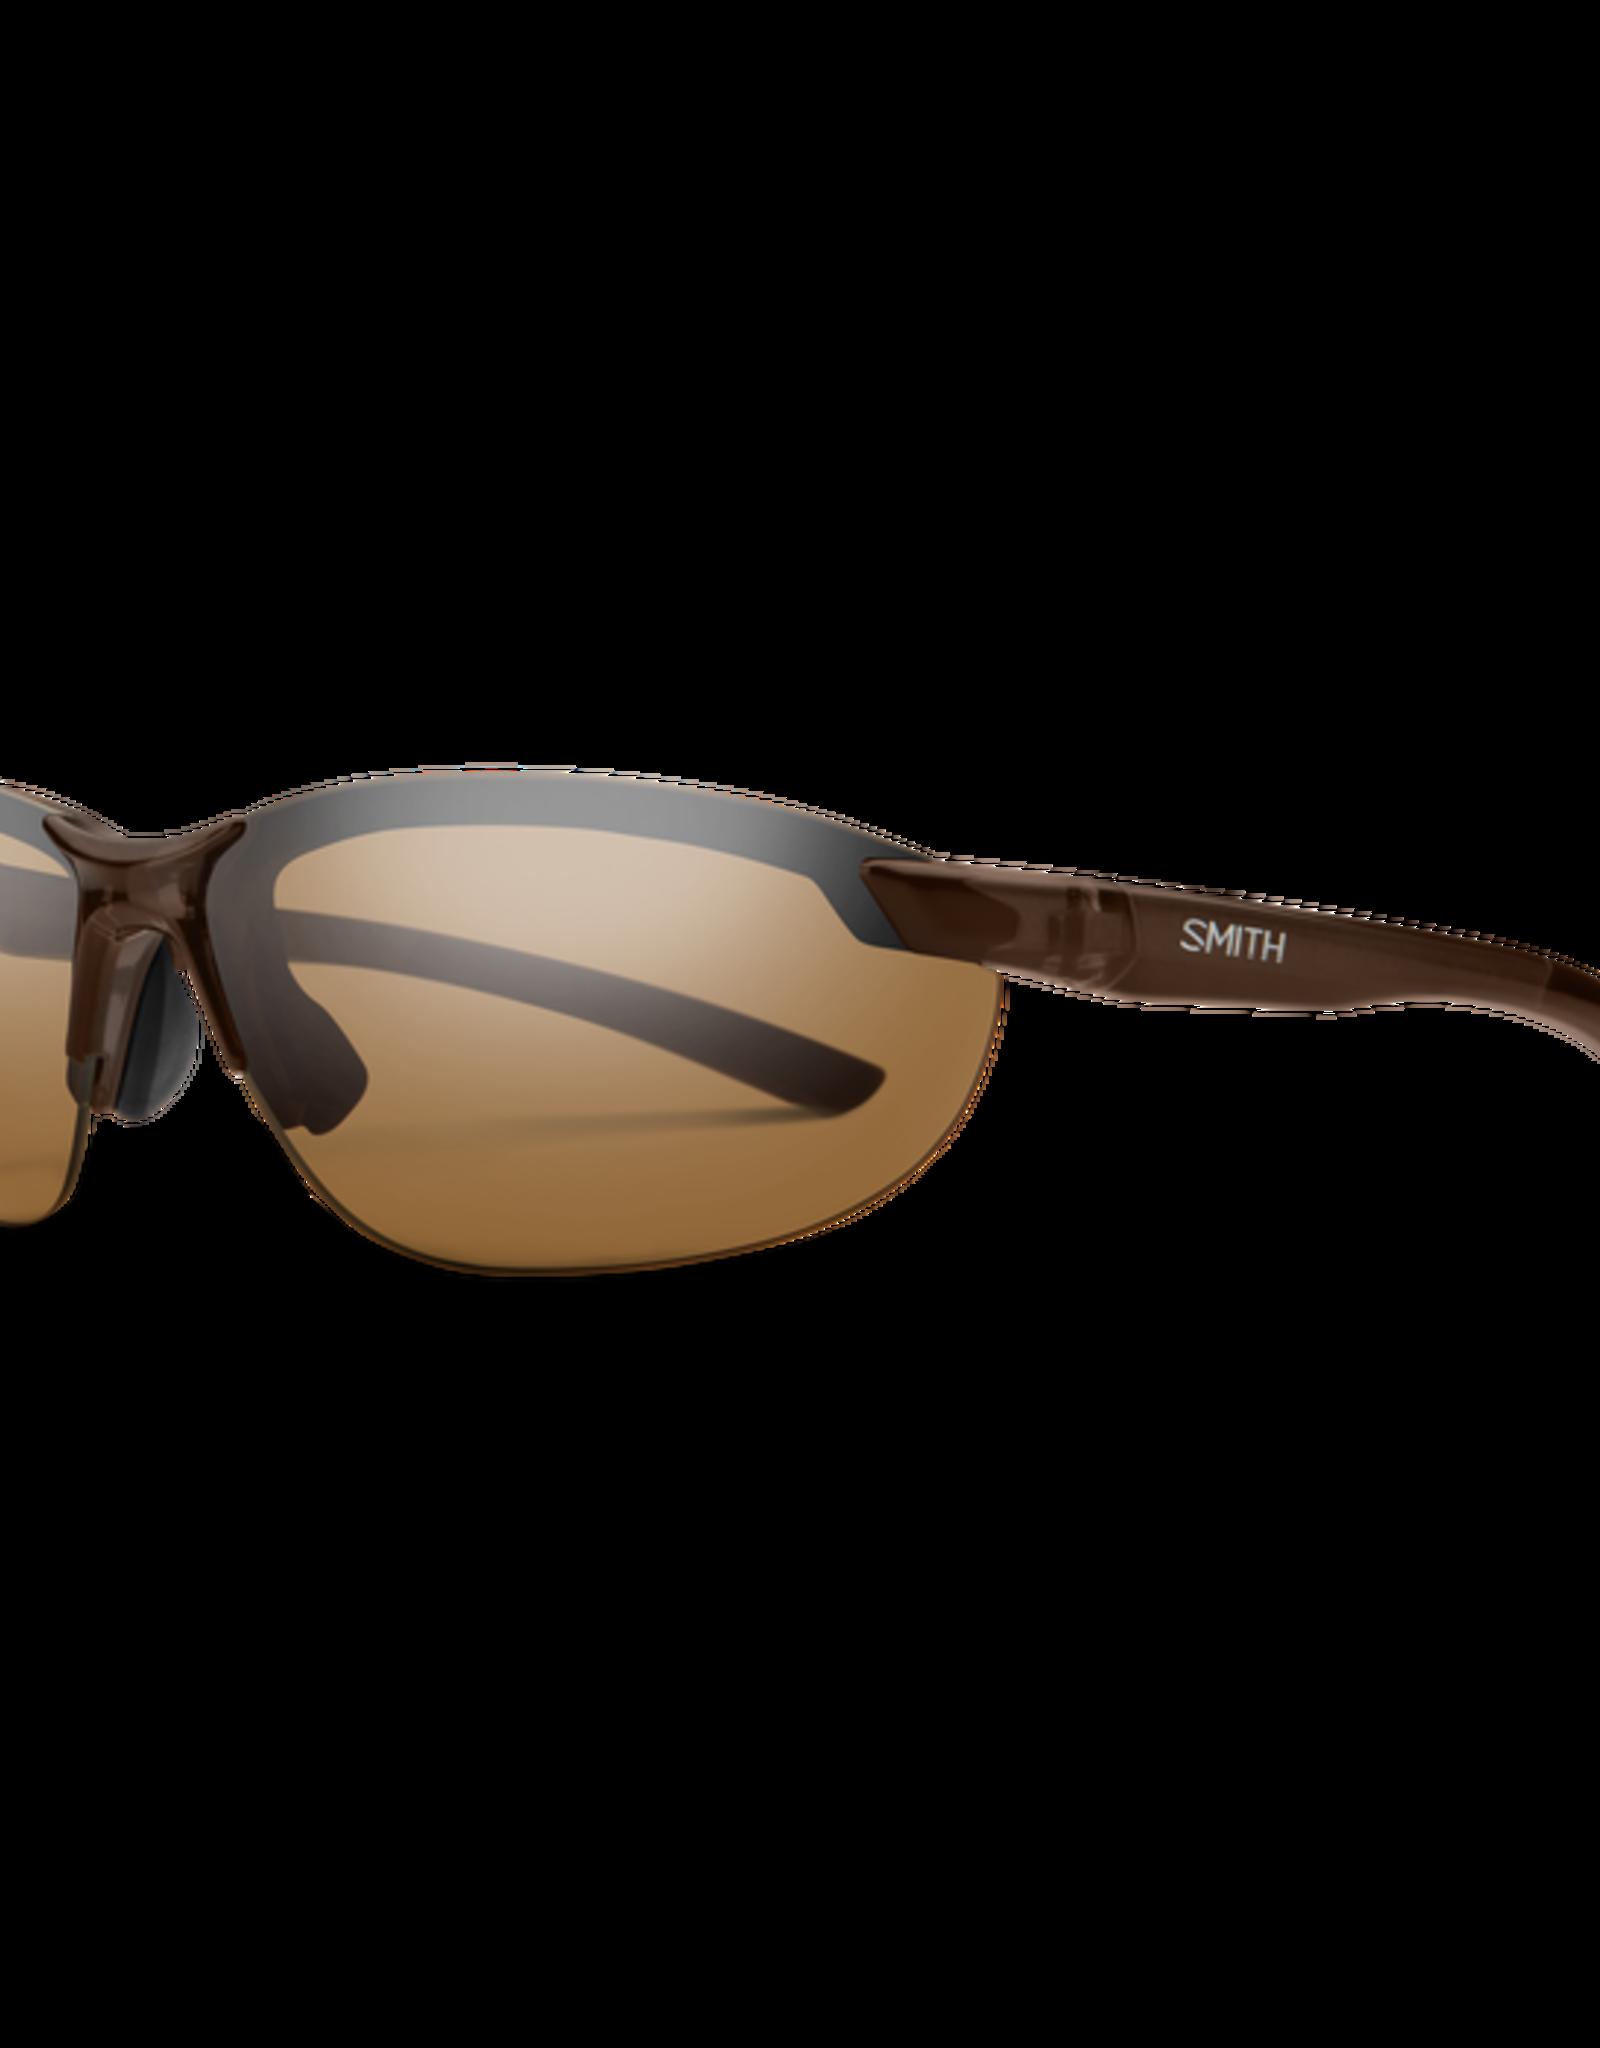 Smith Smith Parallel 2 Sunglasses